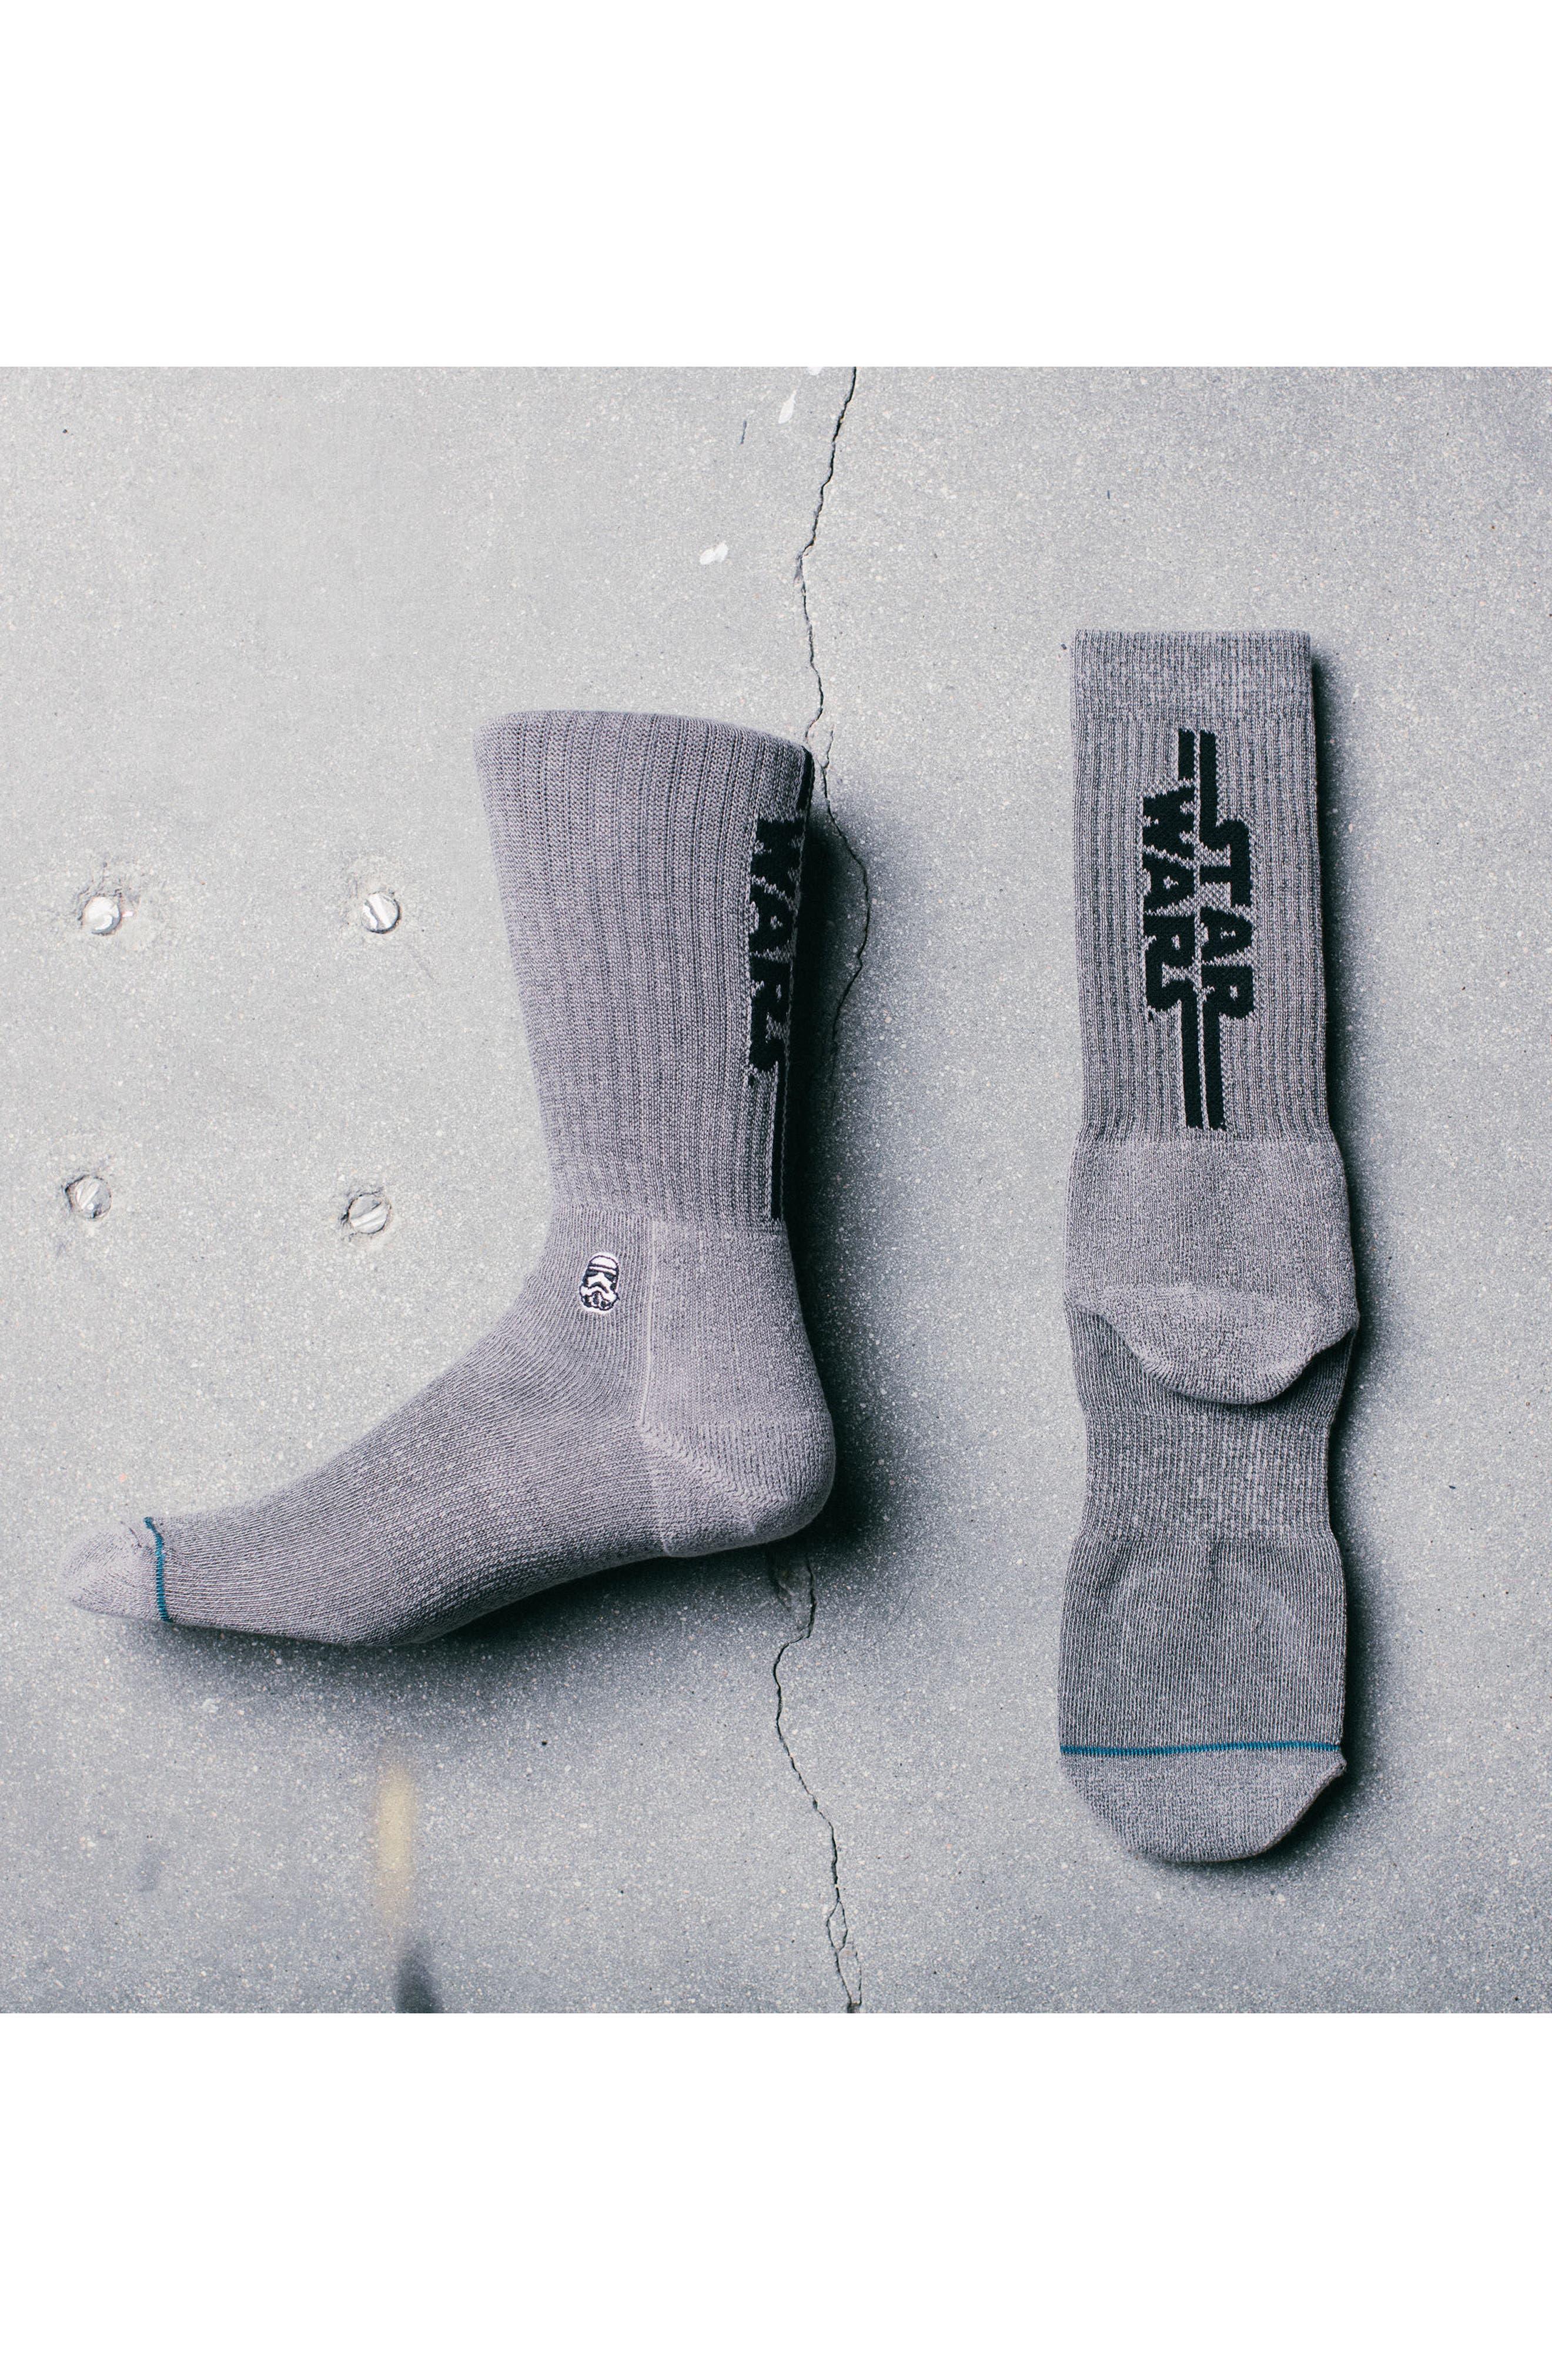 Star Wars Solid Trooper Socks,                             Alternate thumbnail 2, color,                             Black